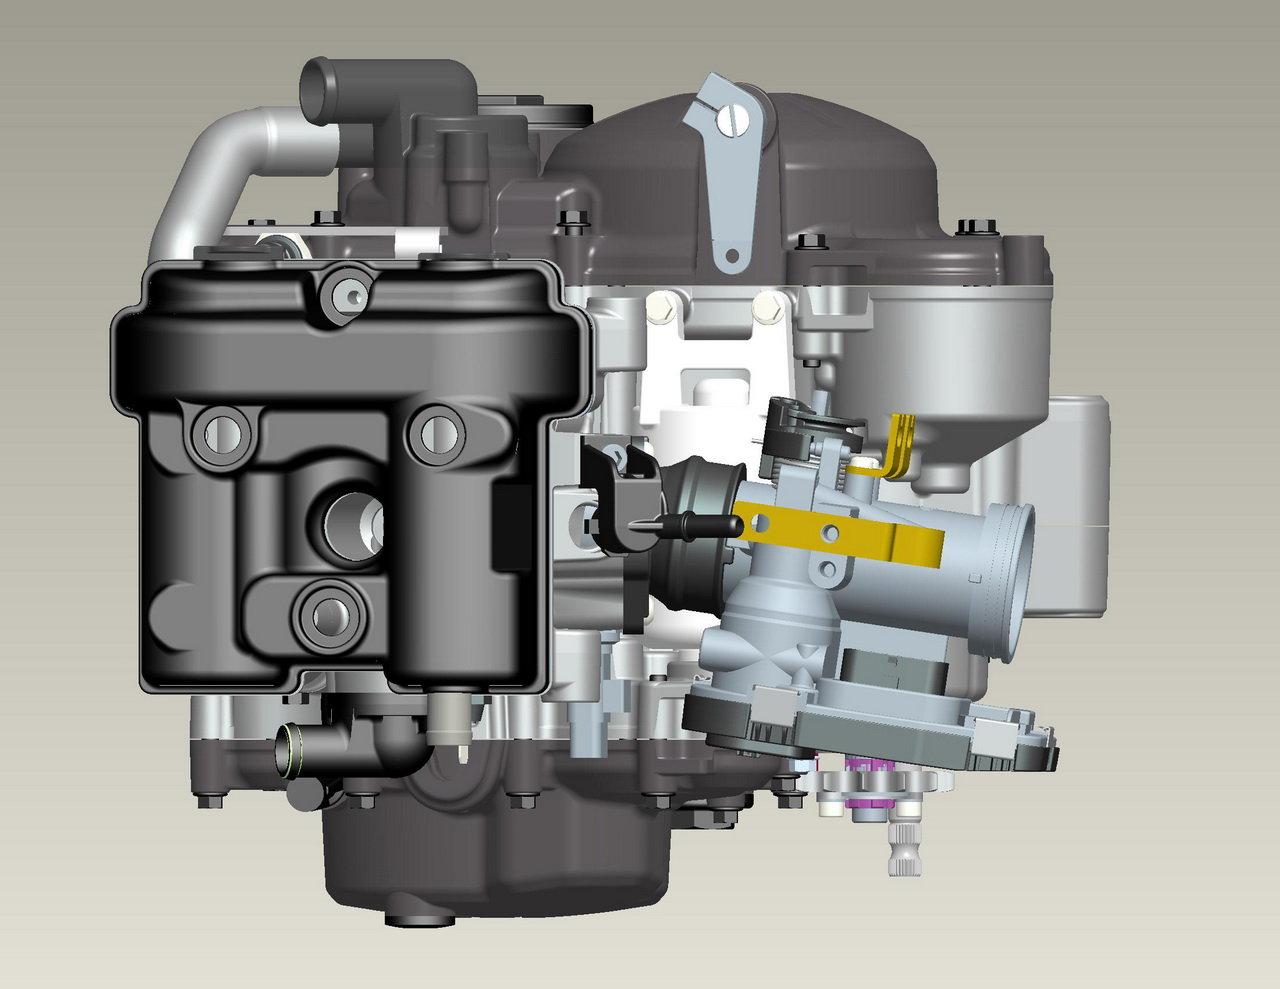 Listino Aprilia RS4 125 Replica Moto 50 e 125 - image 14312_aprilia-rs4125 on http://moto.motori.net